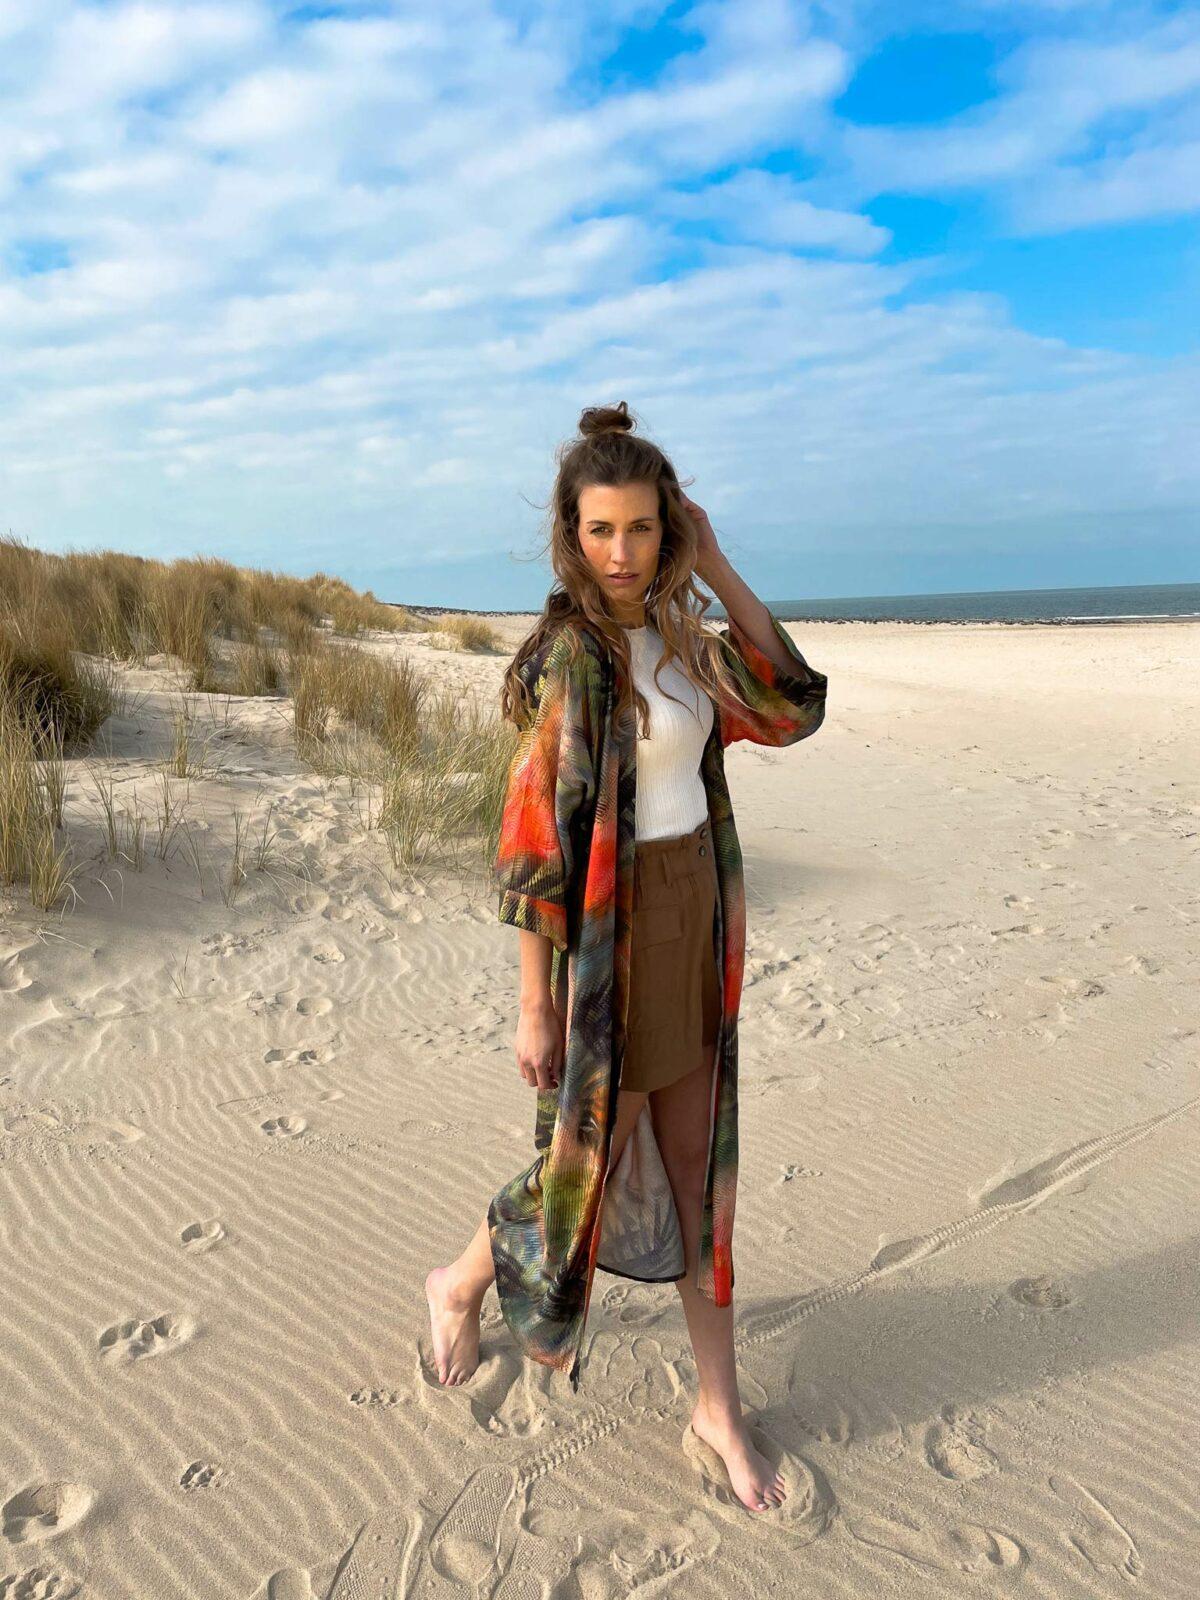 woman on the beach wearing a kimono